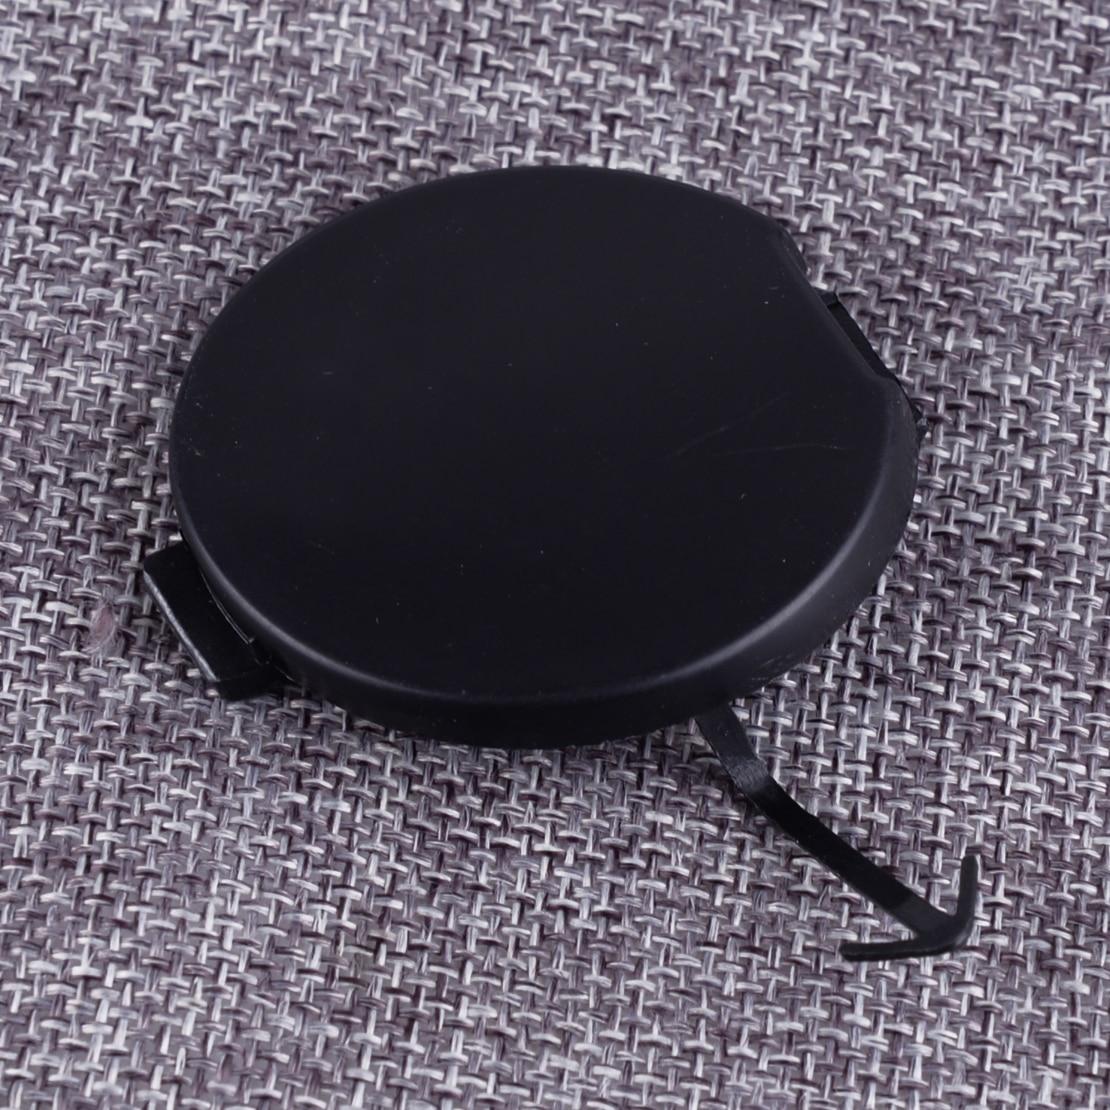 DWCX Car Black Front Bumper Tow Hook Eye Cover Cap Fit for MITSUBISHI Lancer 2008 2009 2010 2011 2012 2013 2014 2015 2016